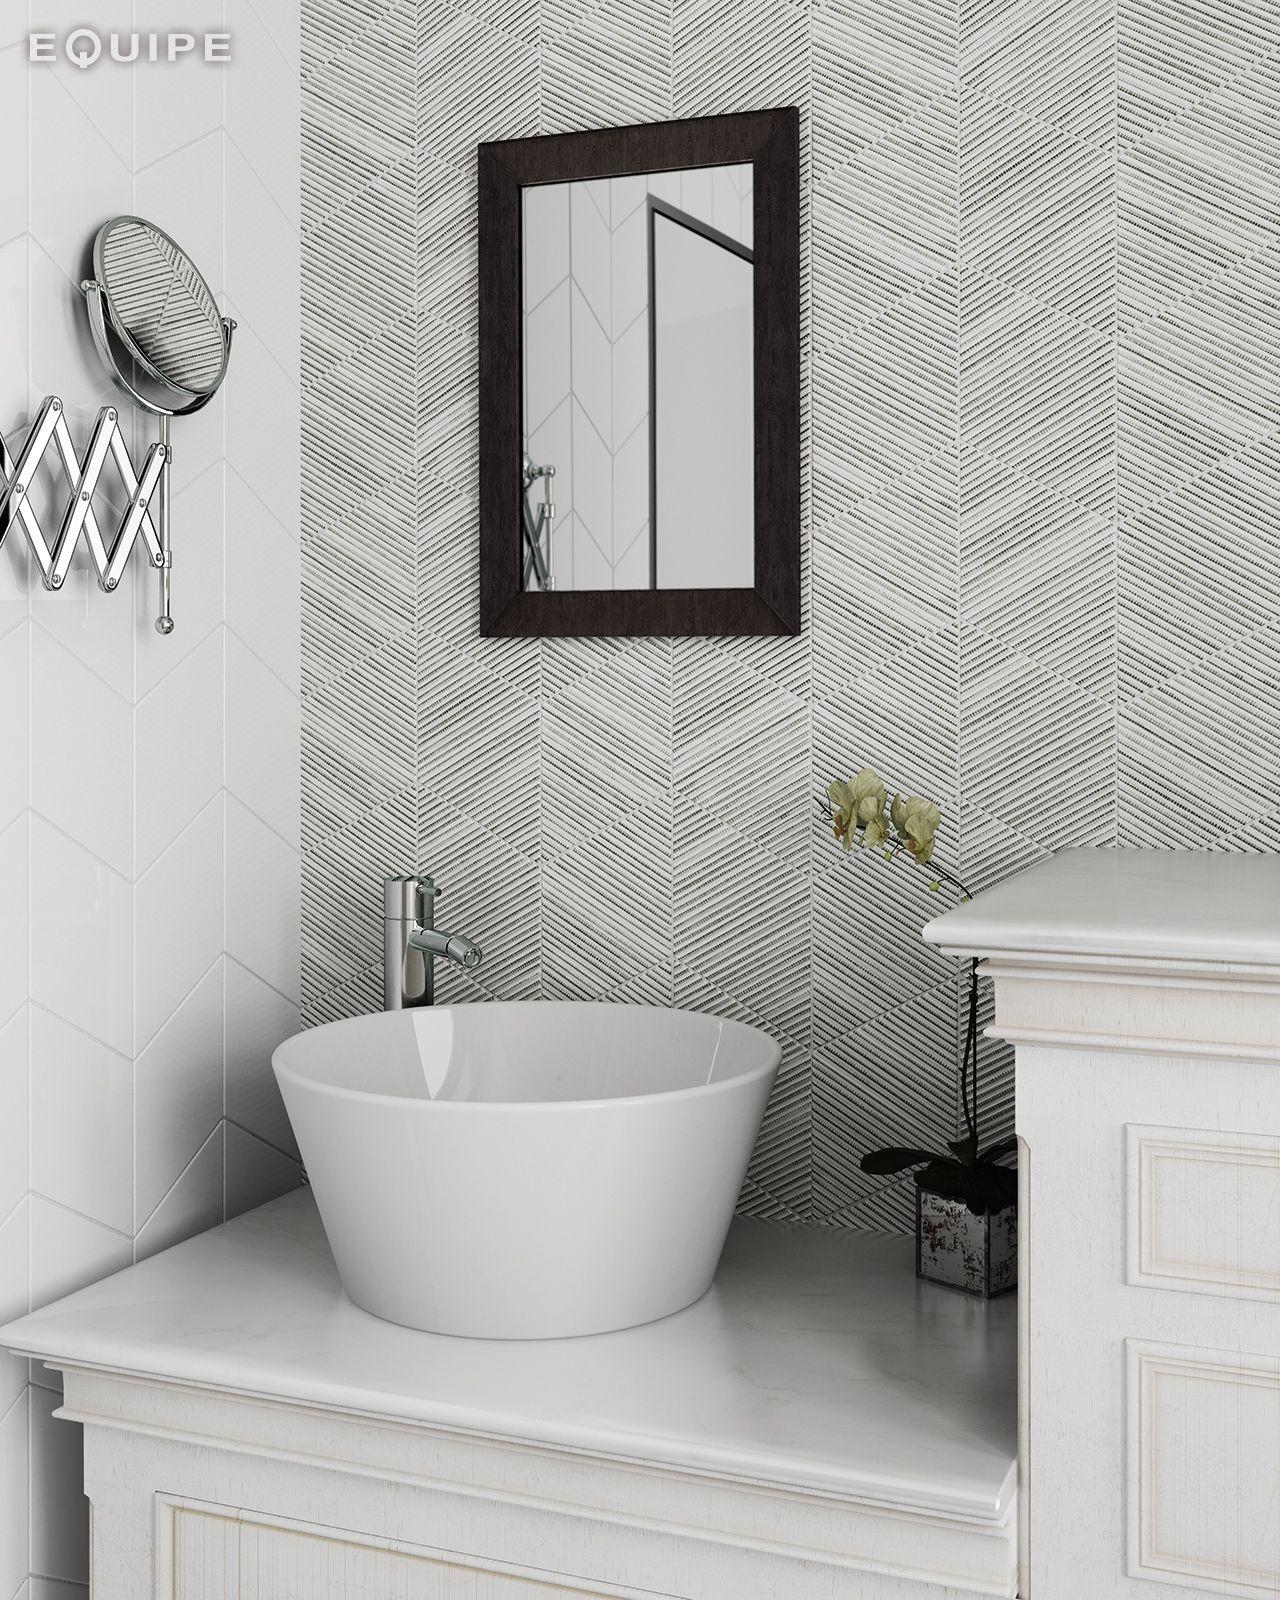 Rhombus Wall White, Decor Bambú B&W 15,2x26,3. #modern, #rhombus ...